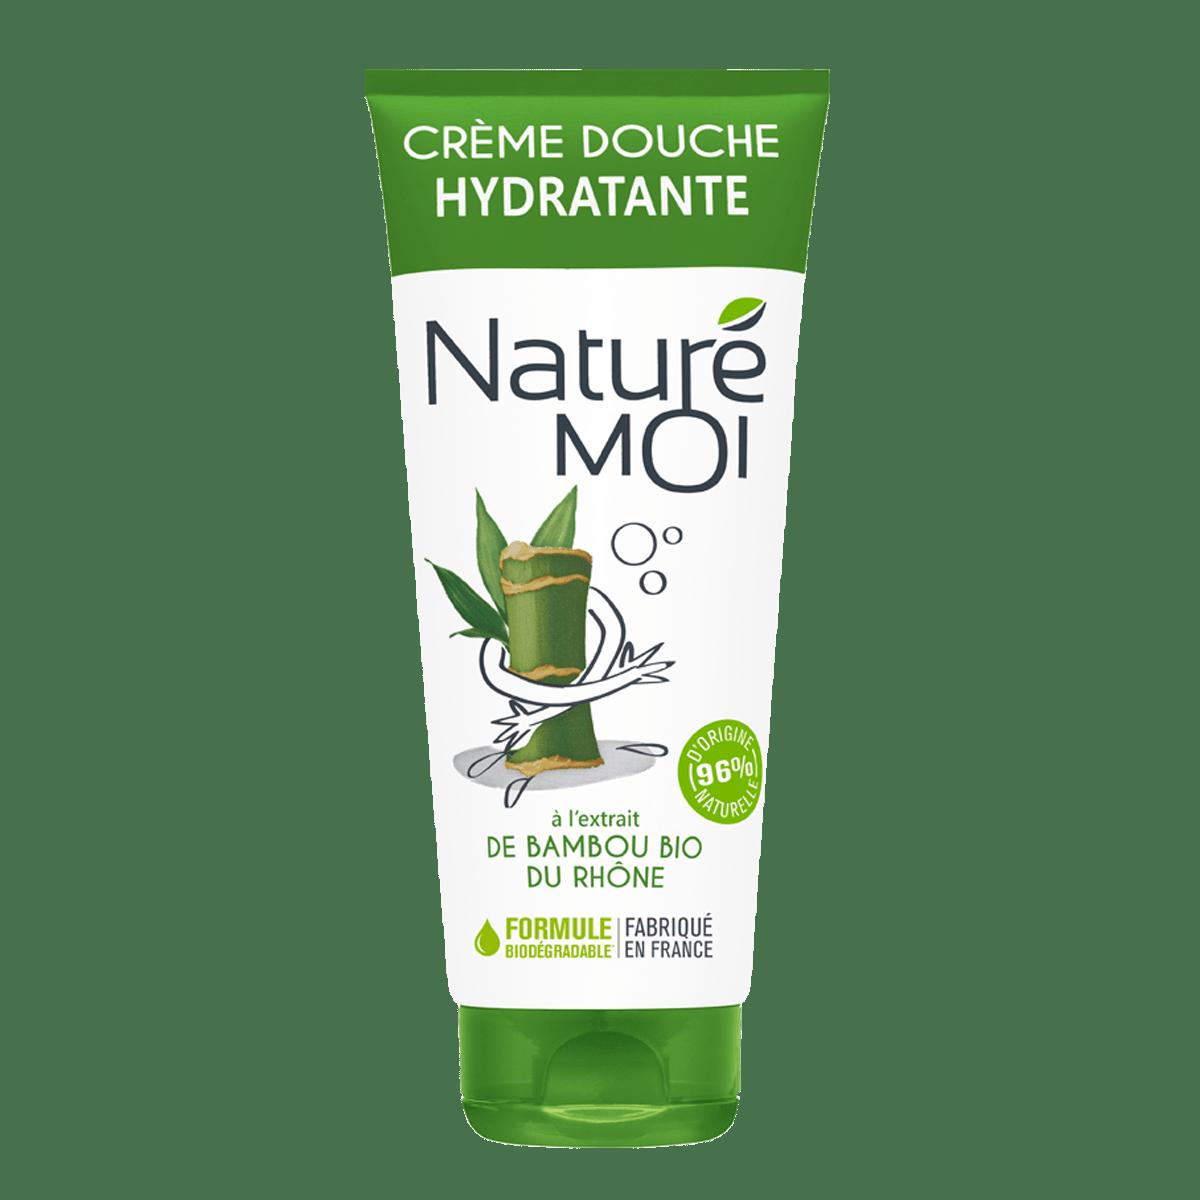 Crème Douche Hydratante au bambou BIO du Rhône